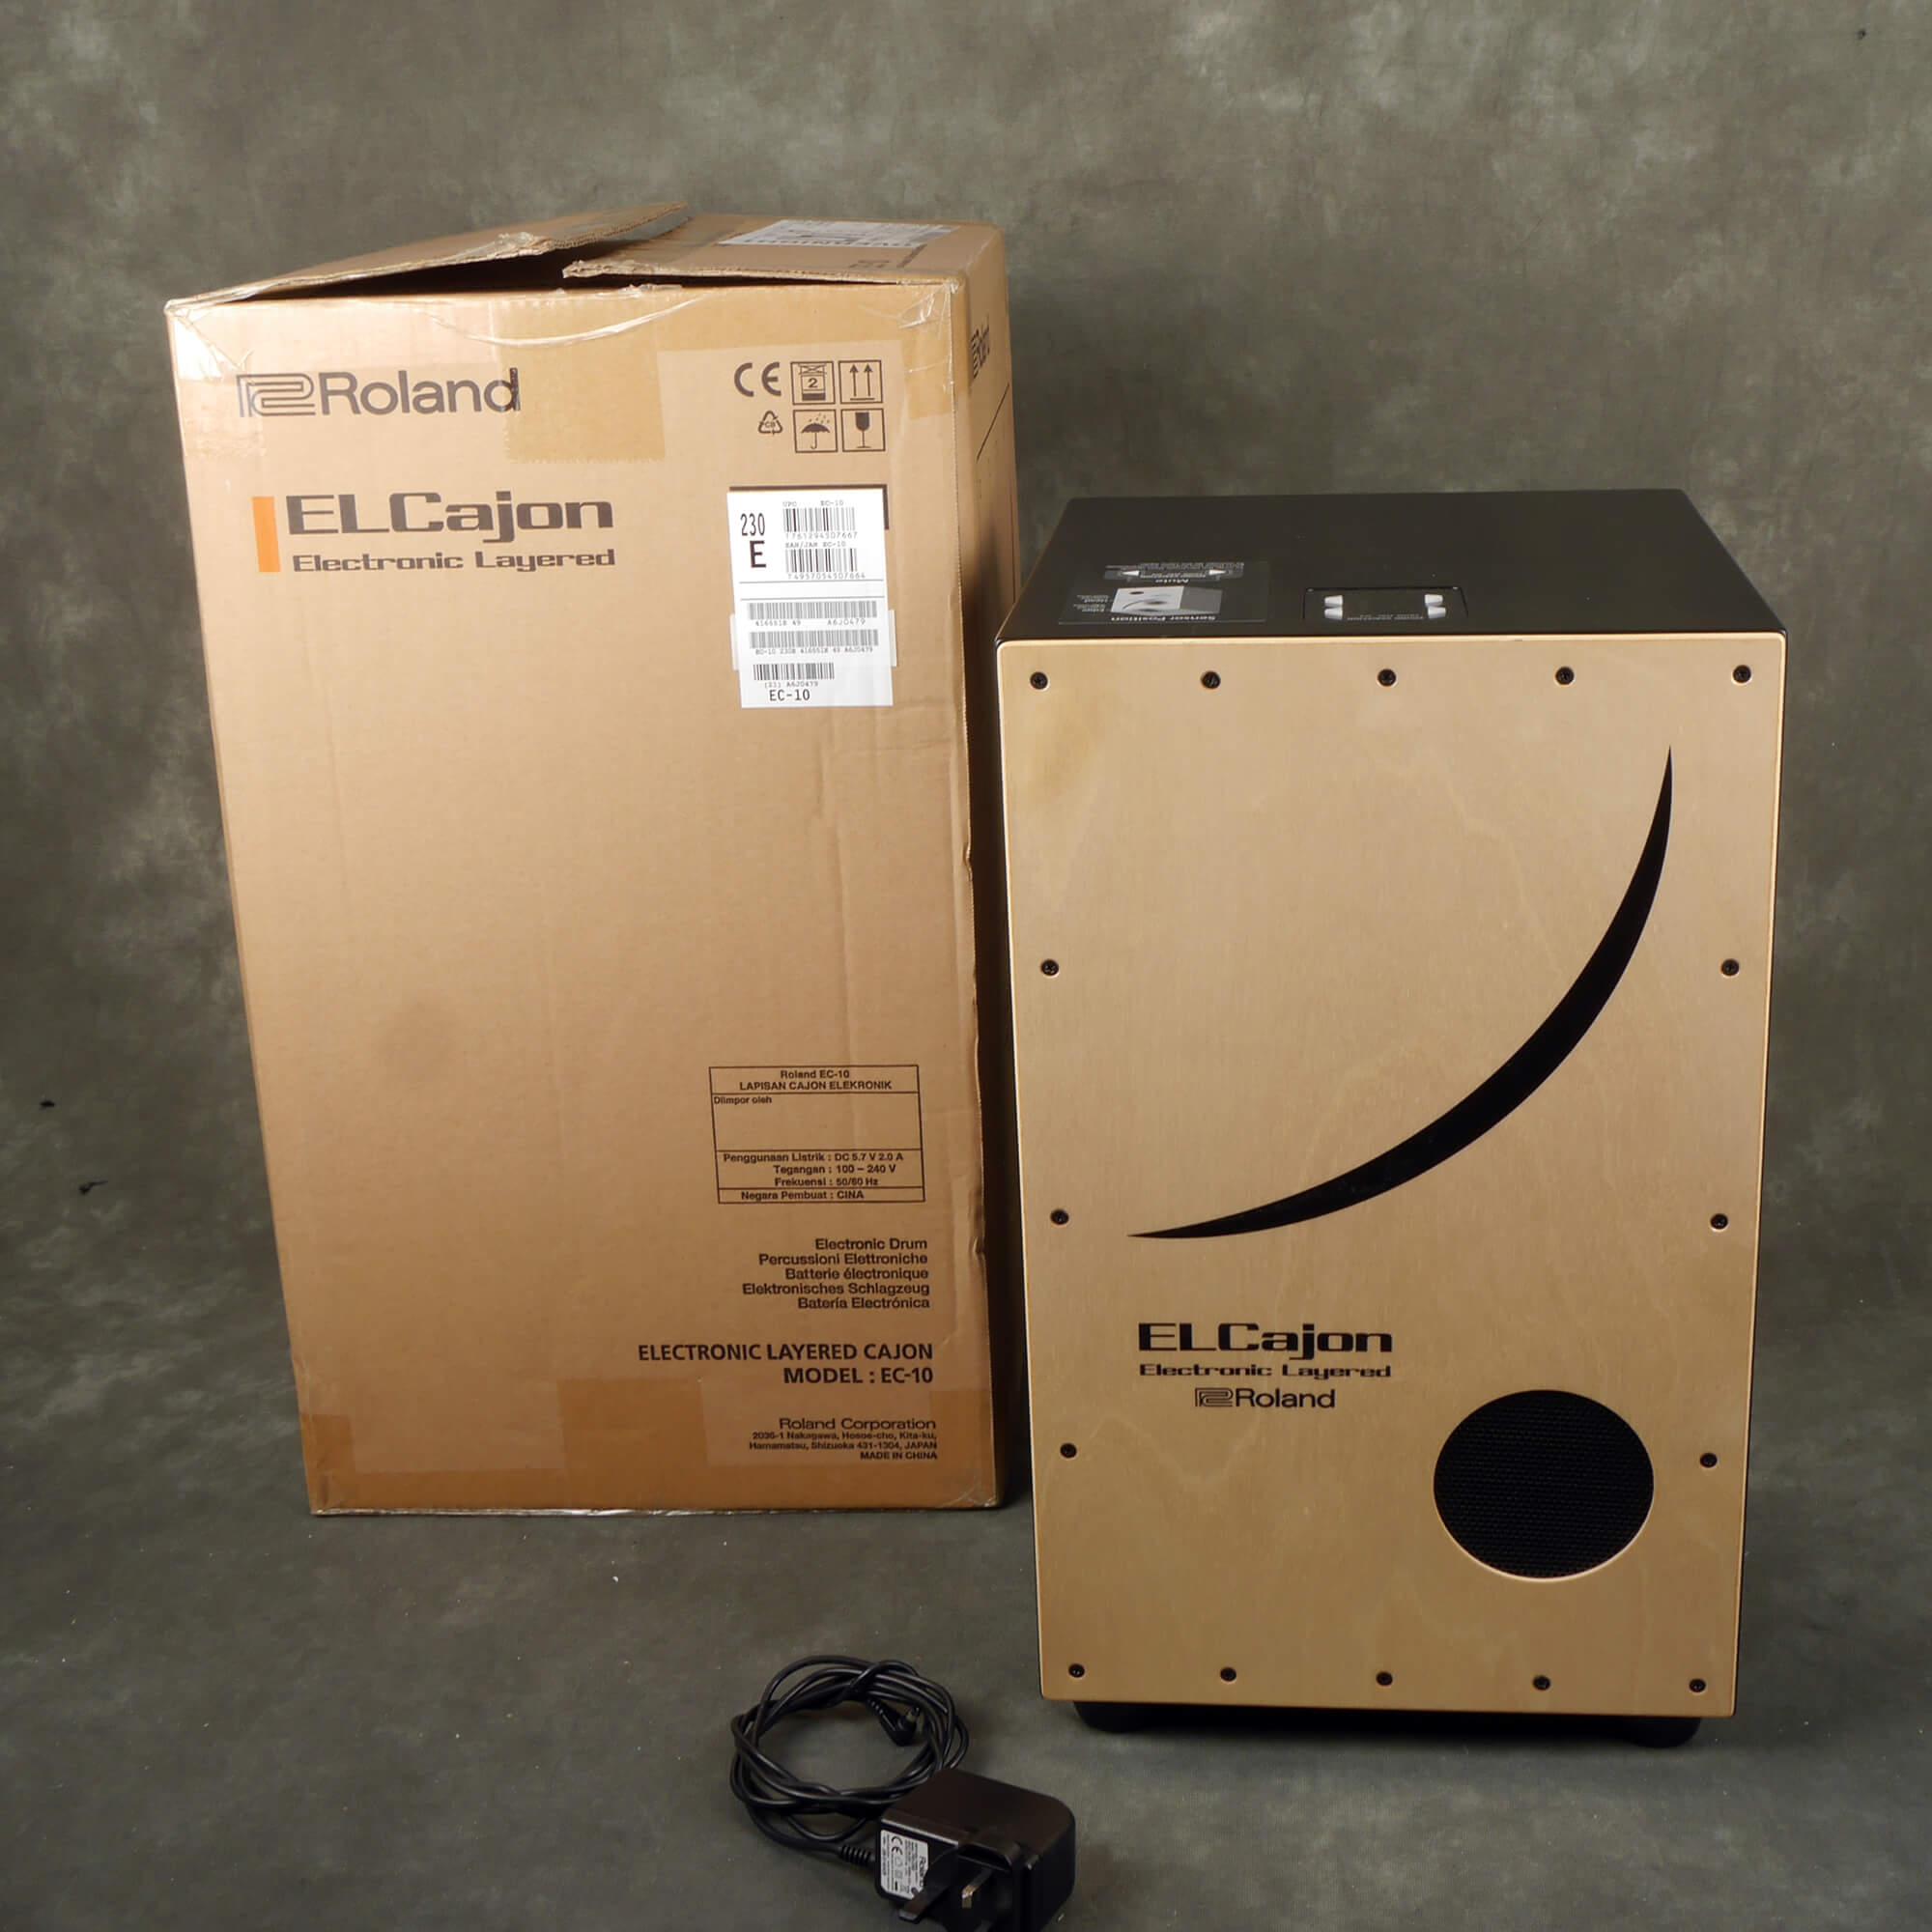 Roland EC10 Electronic Layered Cajon w/Box & PSU - 2nd Hand